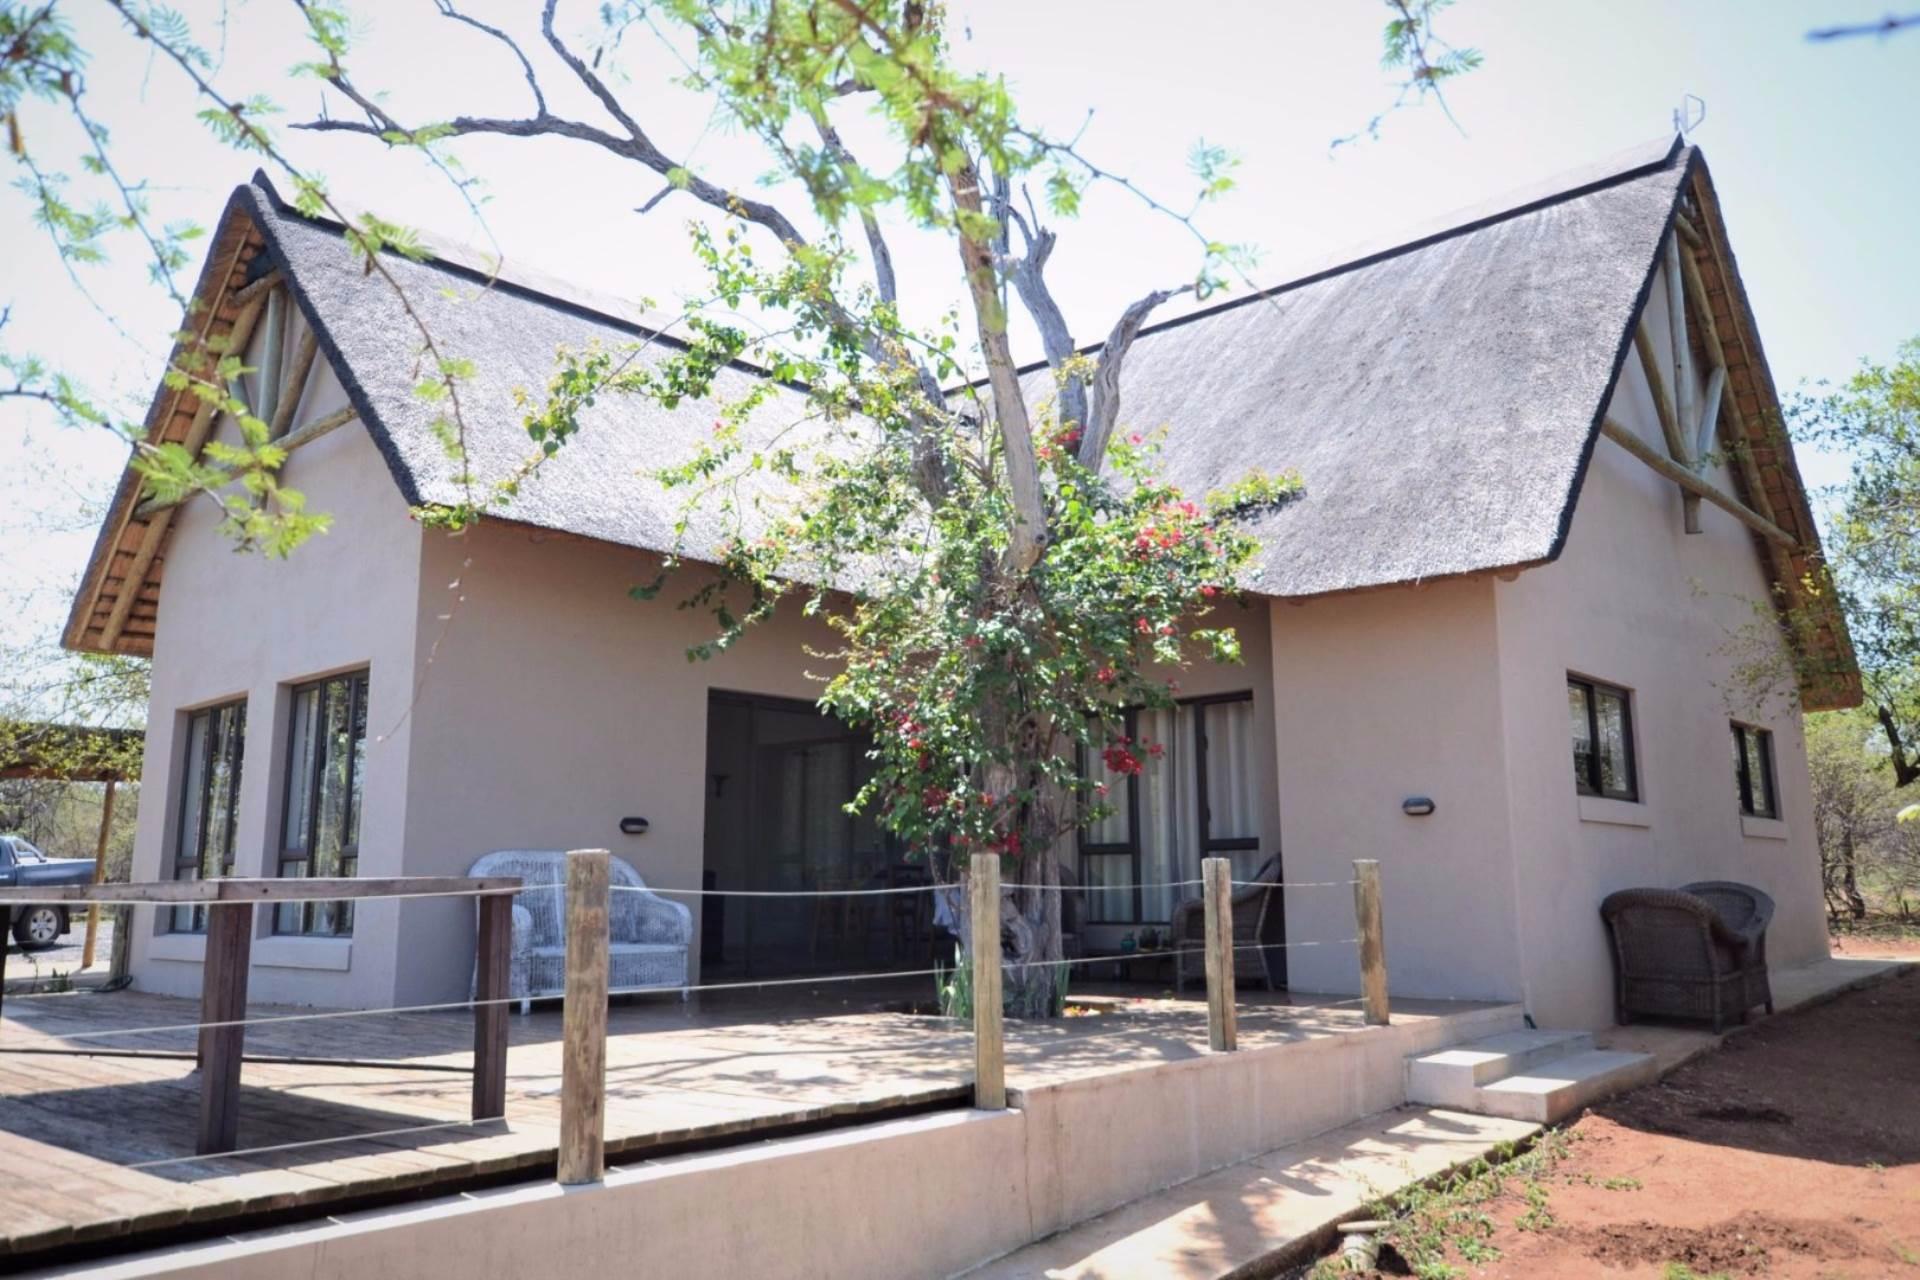 3 BedroomHouse For Sale In Raptors View